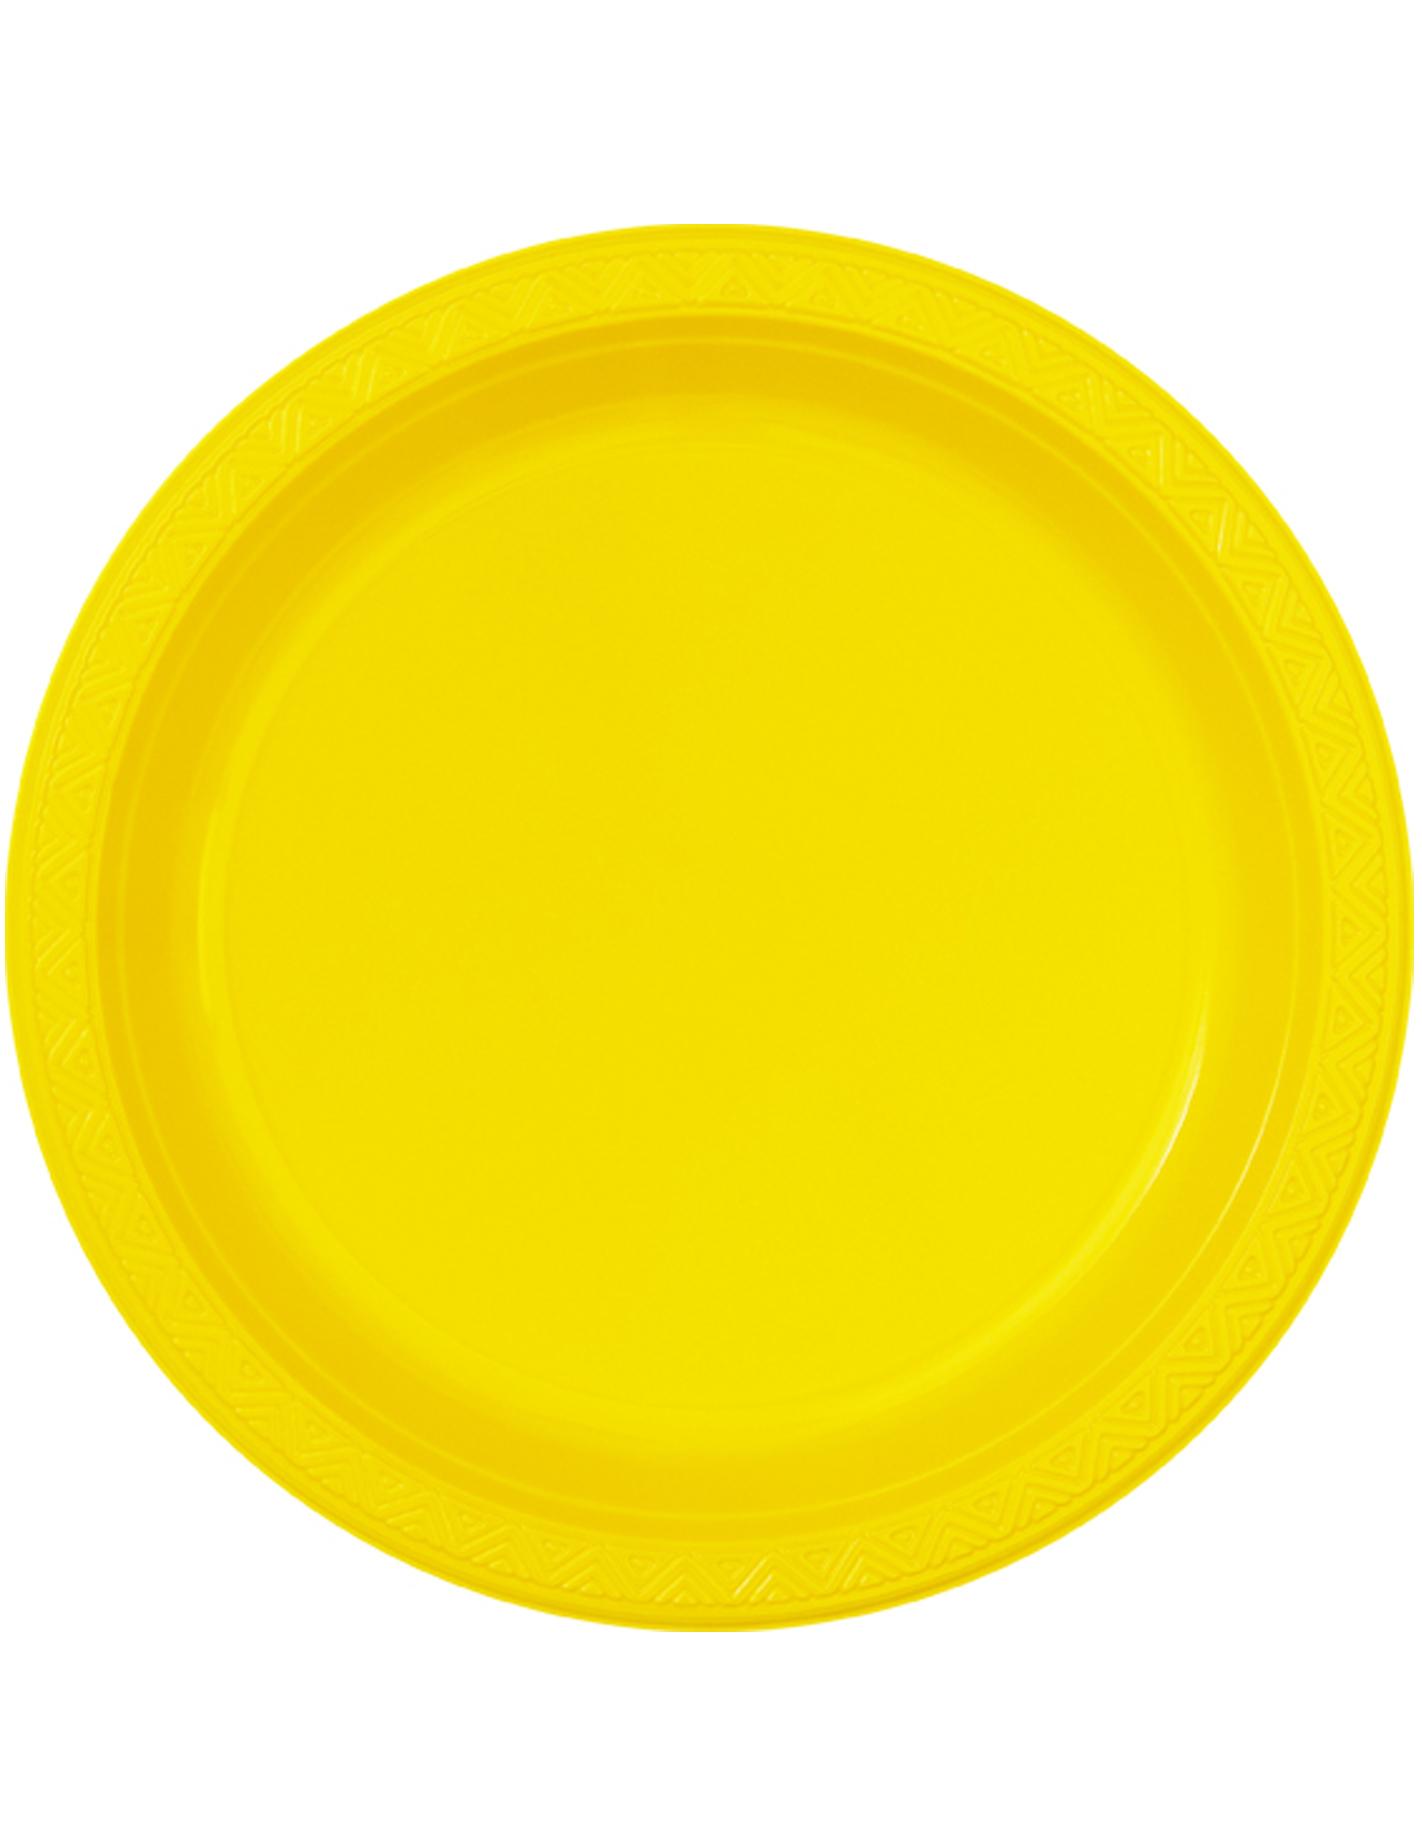 6 grandes assiettes jaunes rondes en plastique 25 cm. Black Bedroom Furniture Sets. Home Design Ideas